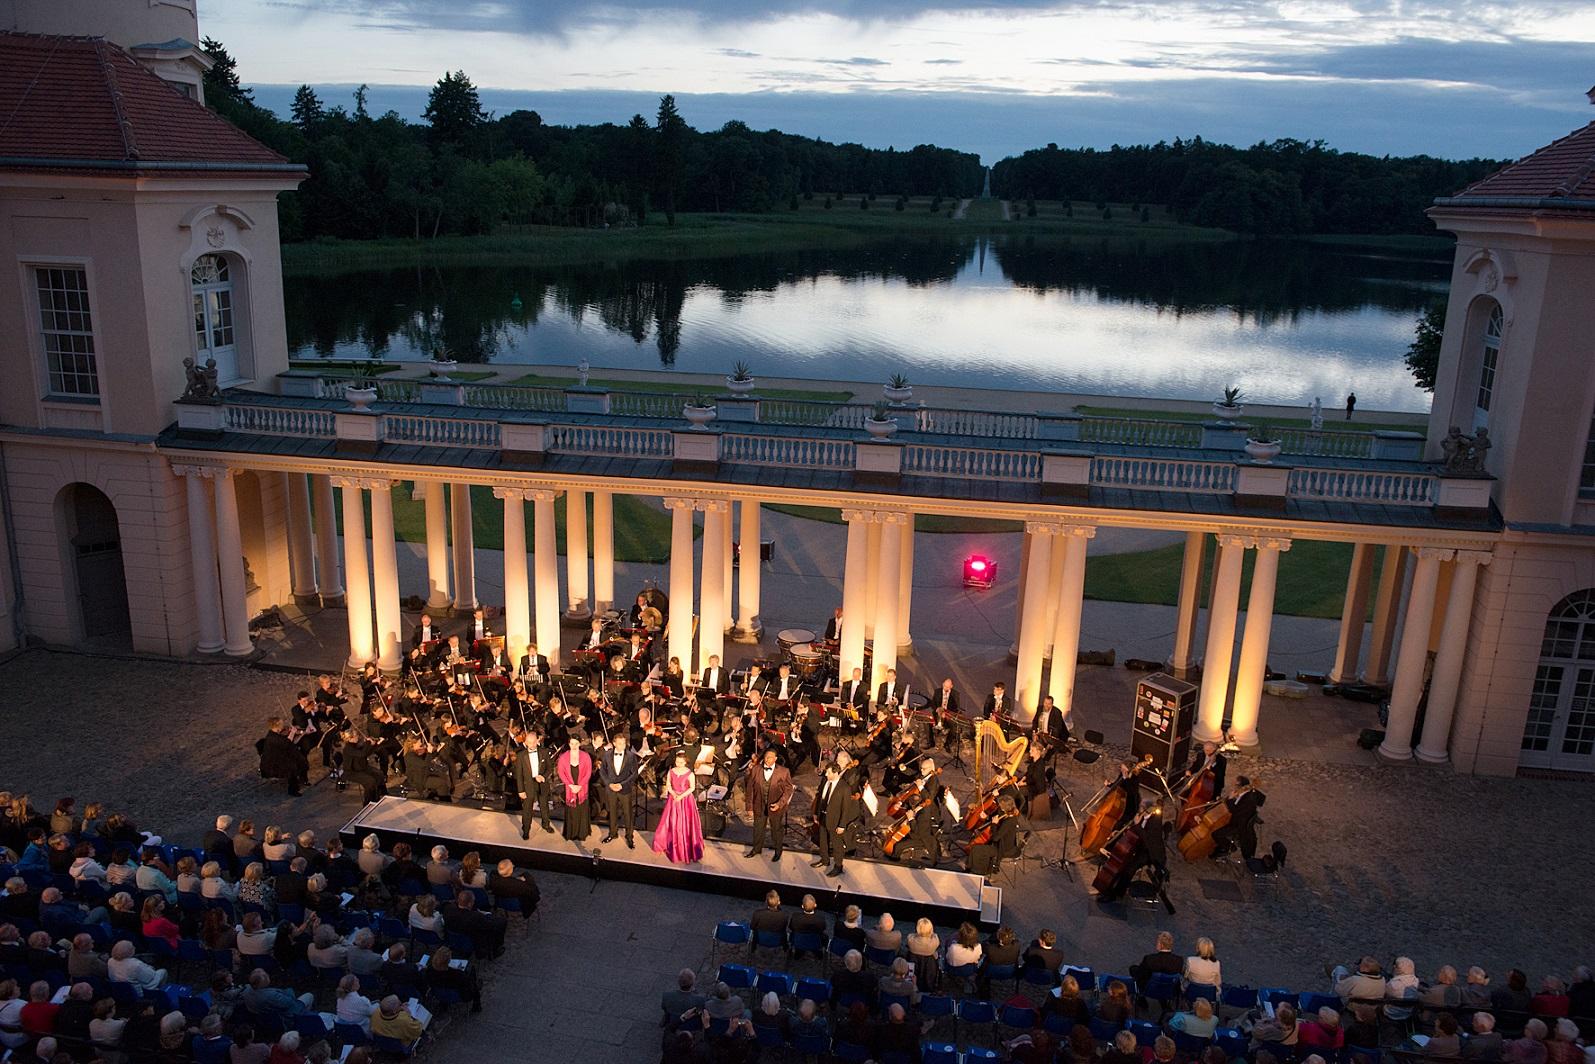 Operngala im Schlosshof Rheinsberg